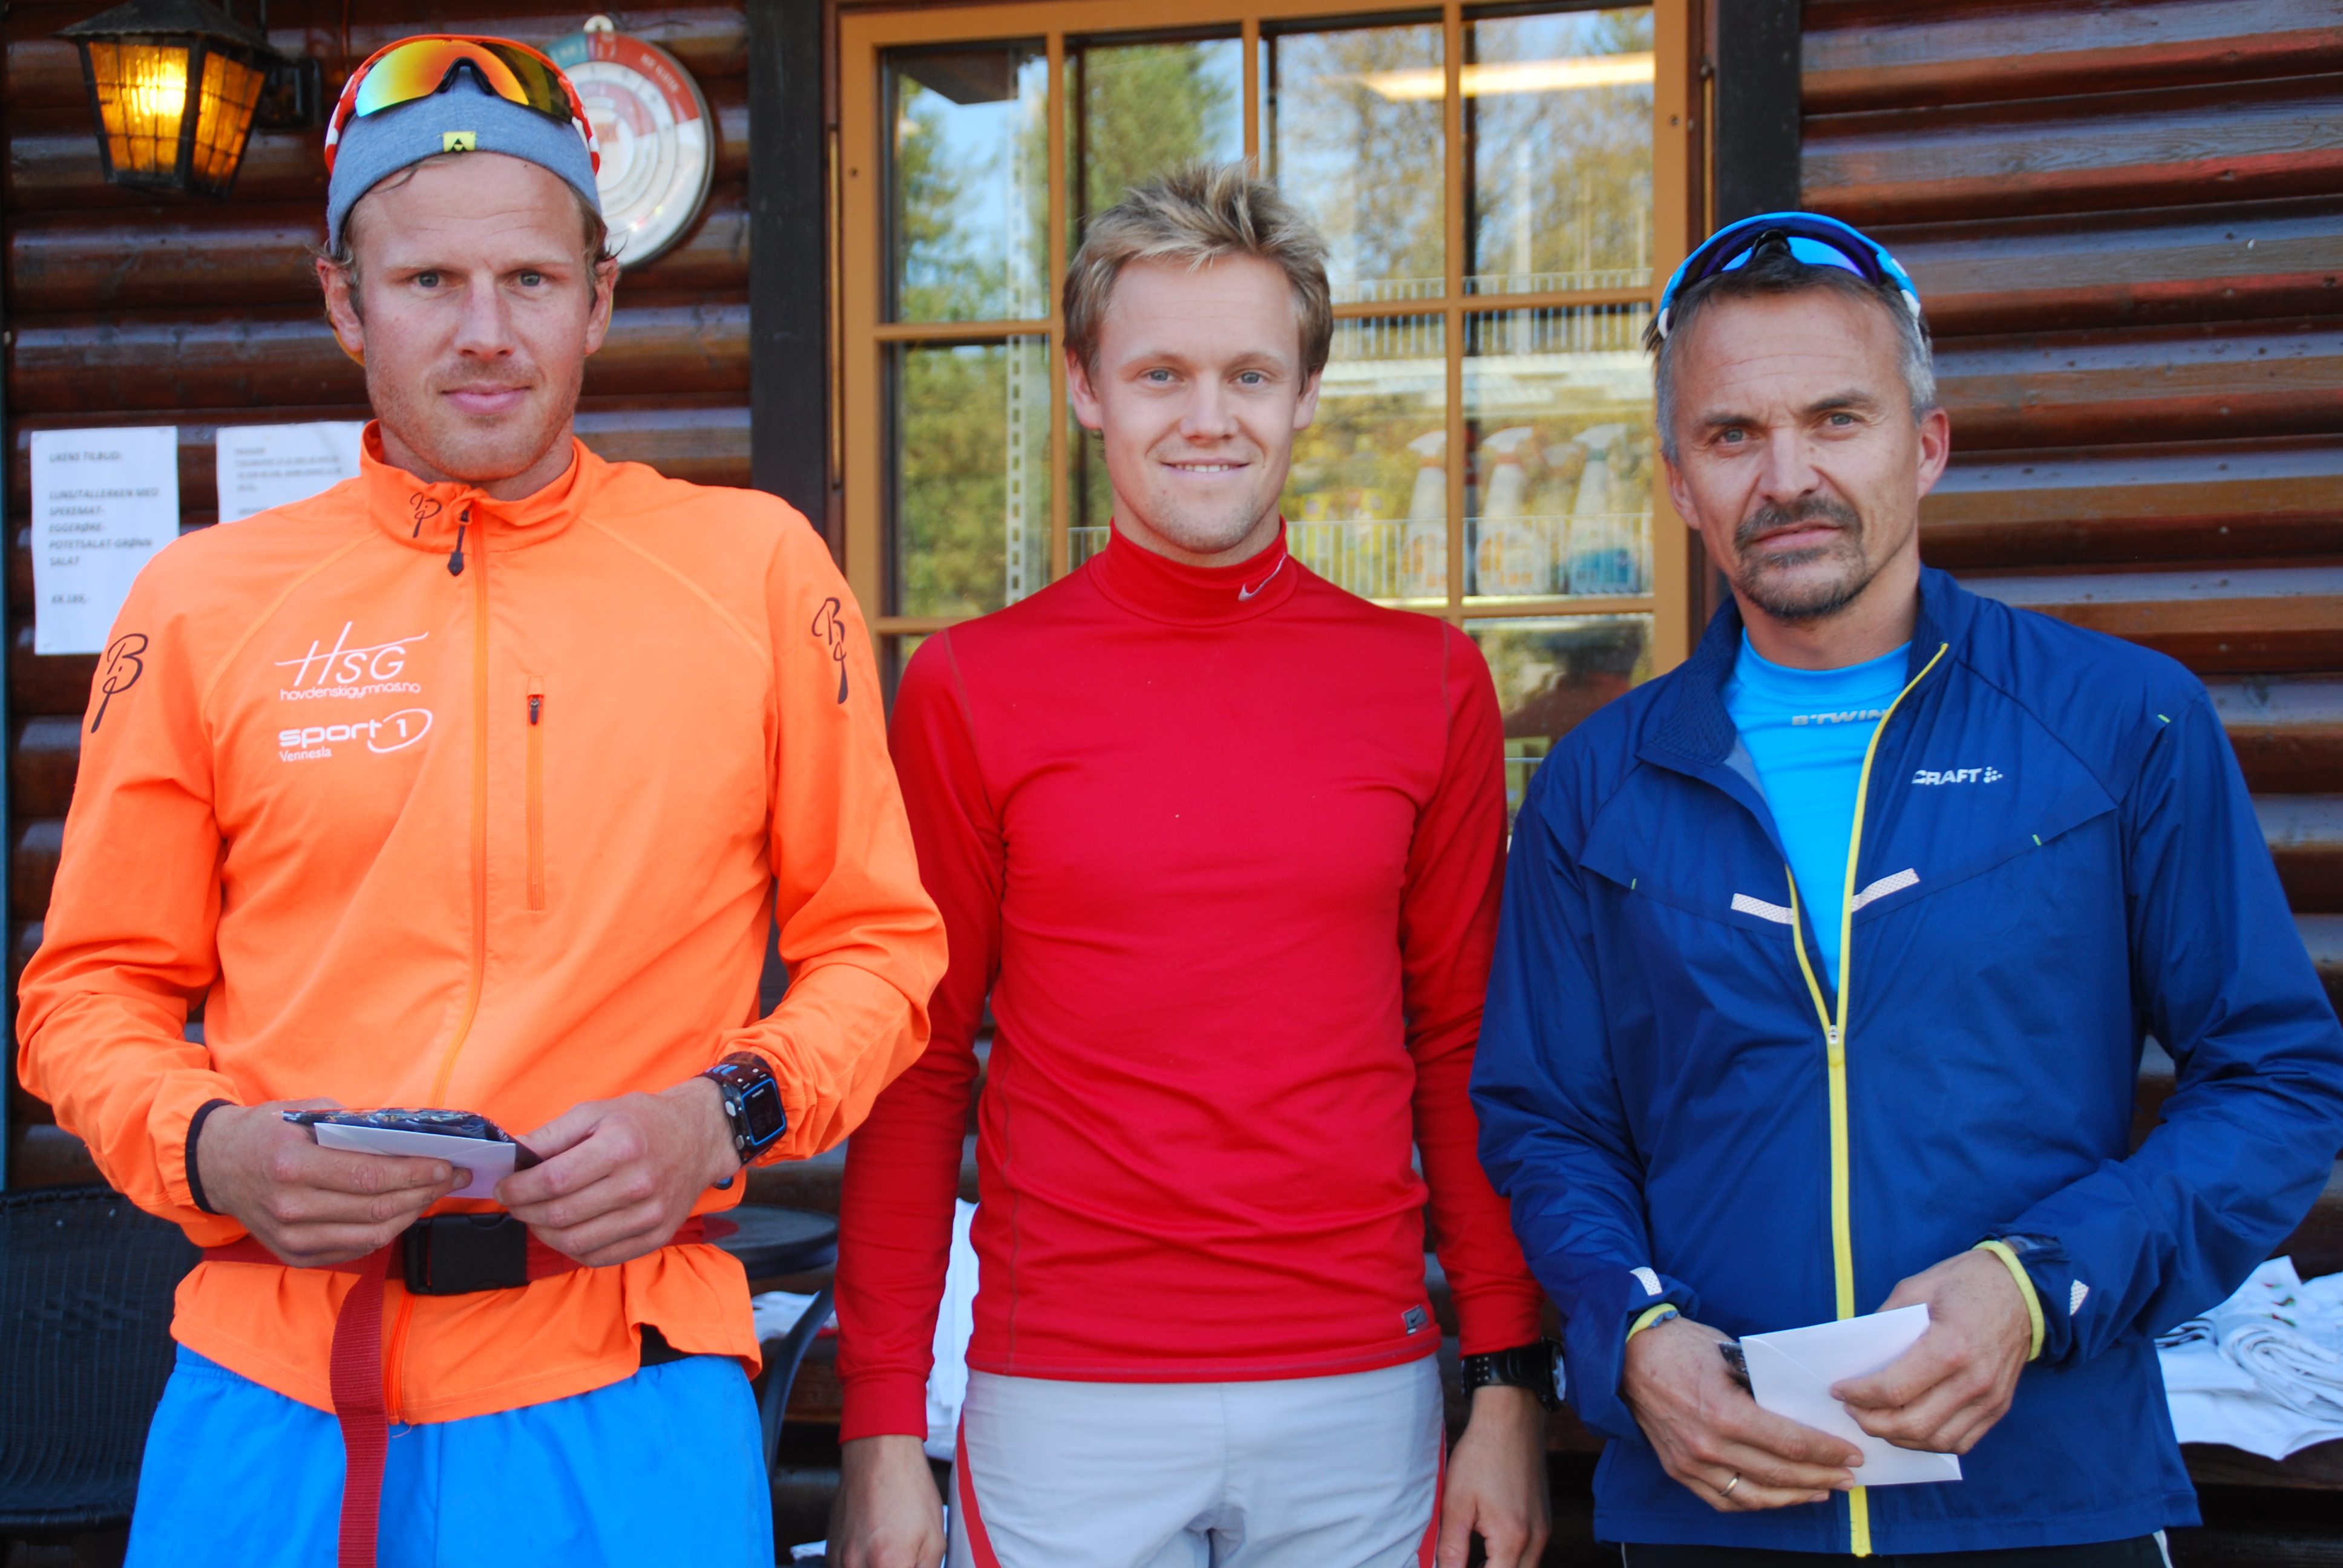 16.09.17 Bjødalskampen OPP - De 3 beste i herreklassen.jpg